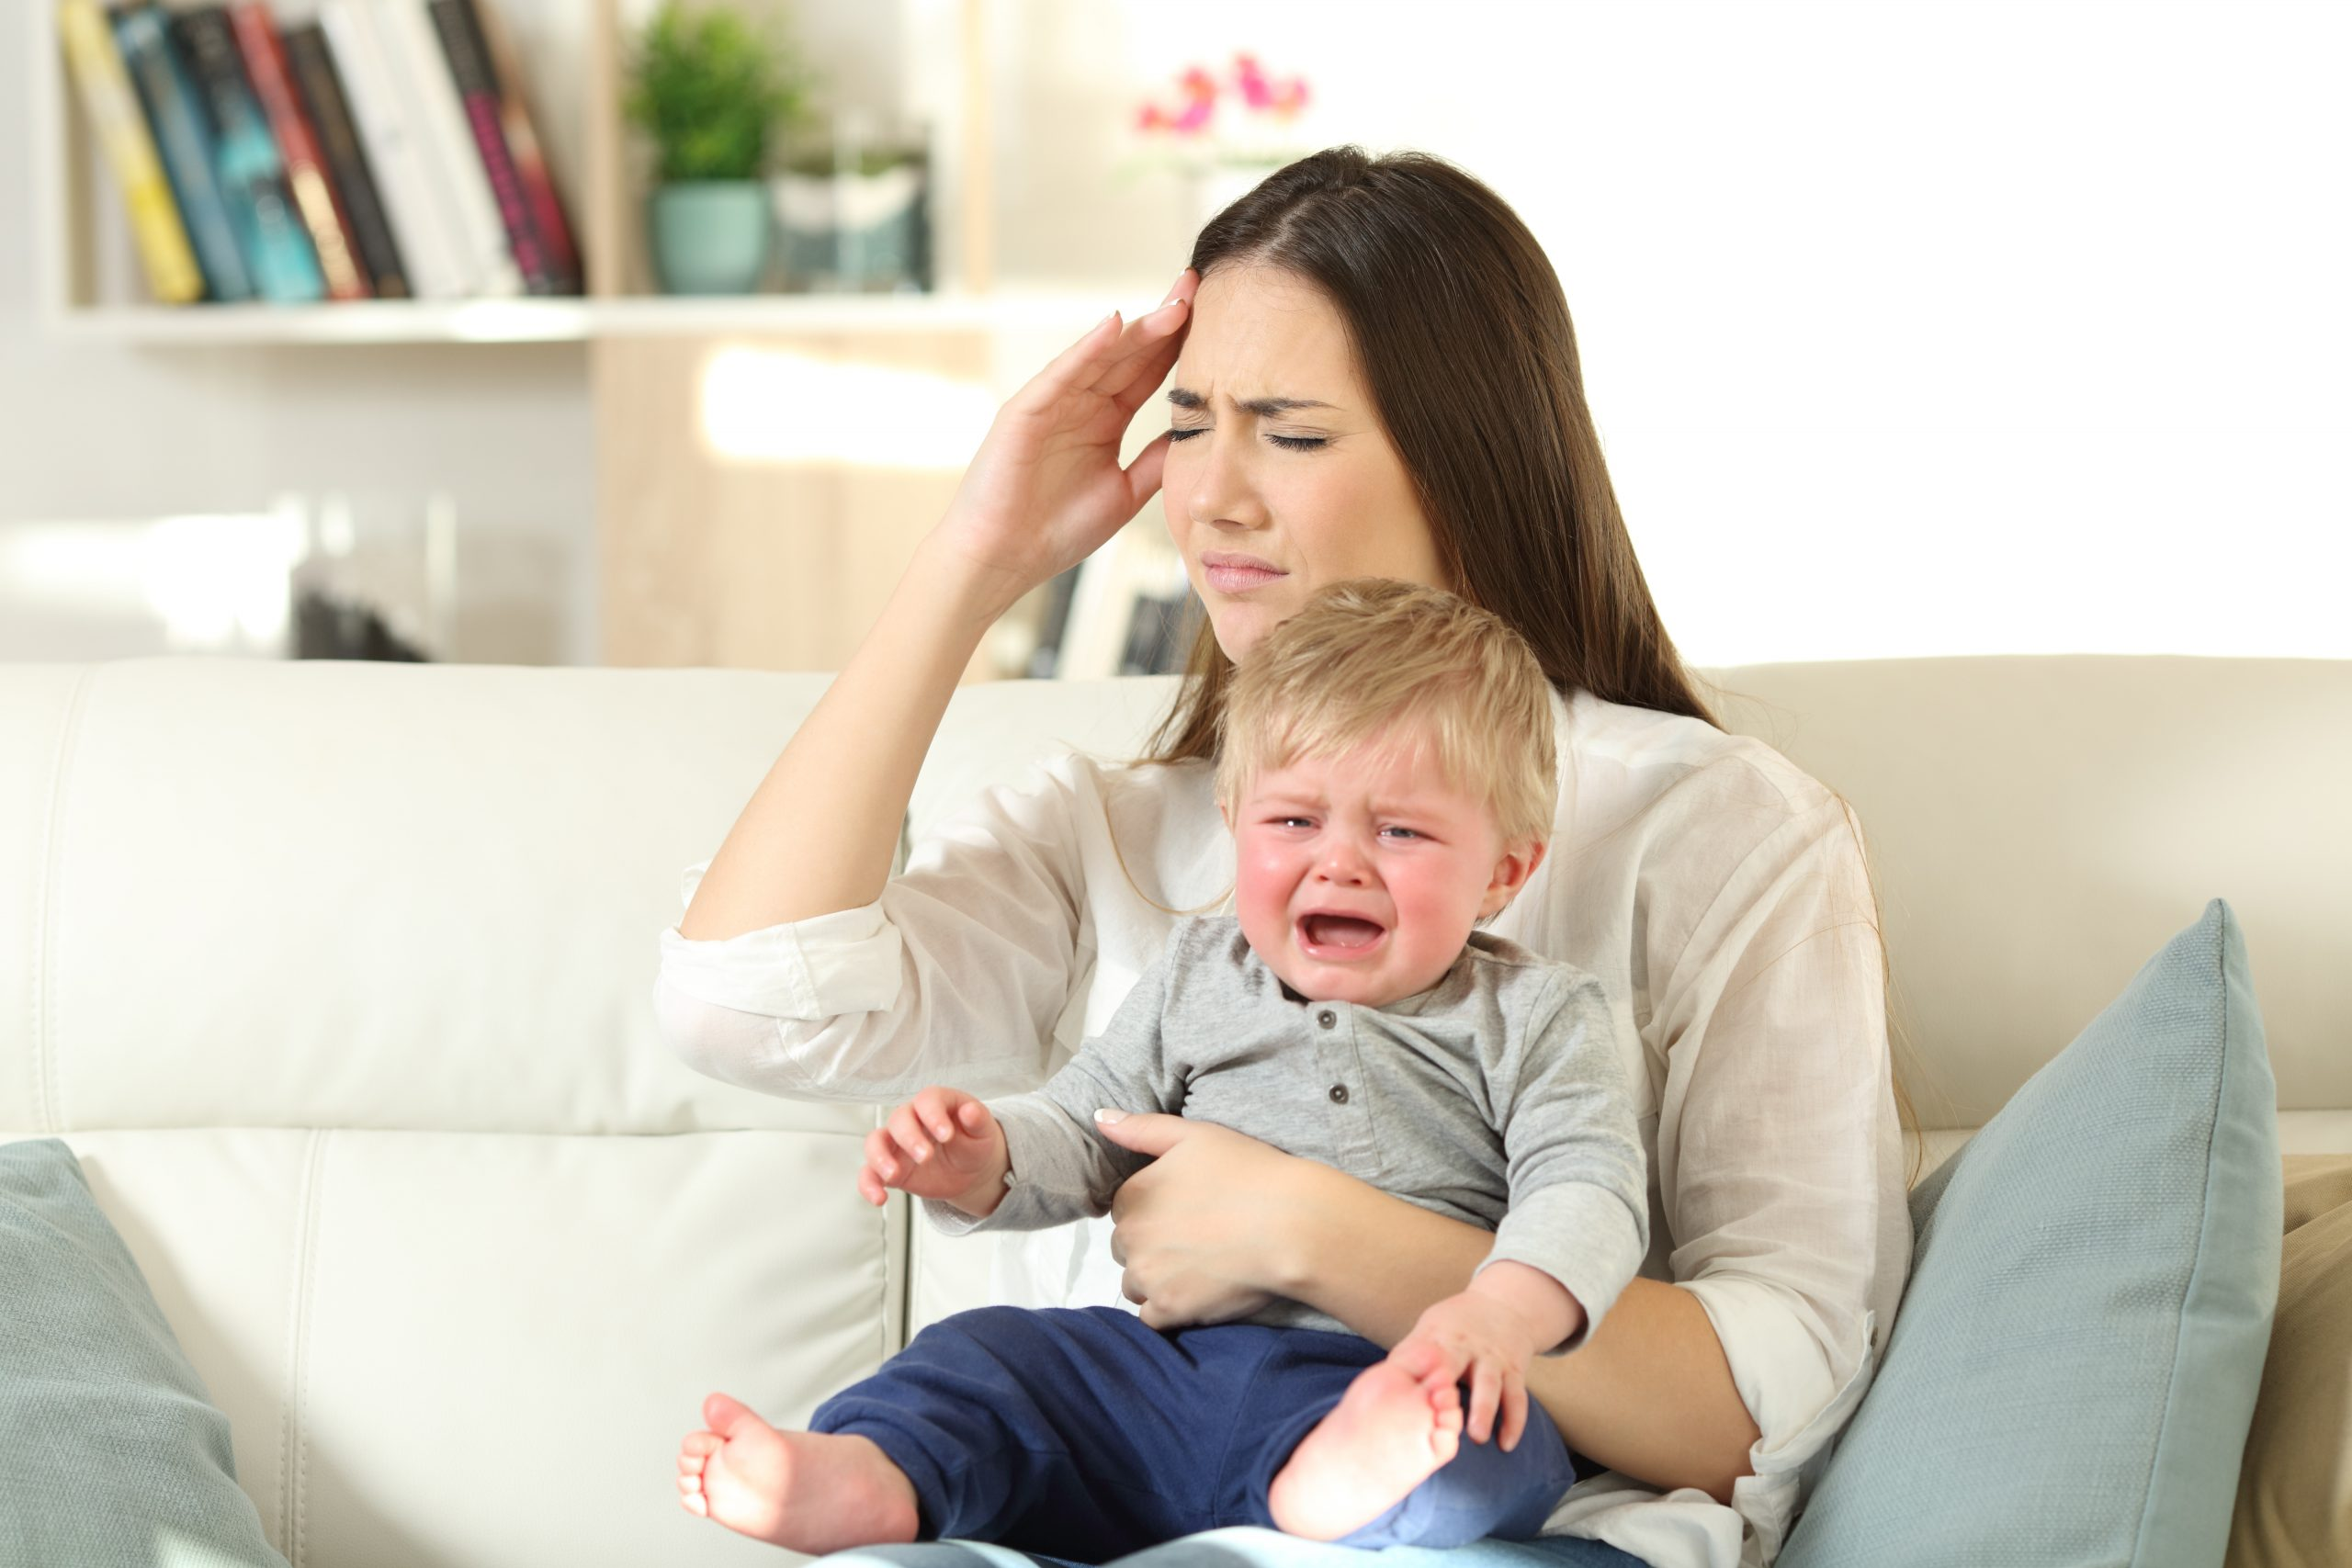 gestresste Mutter hat Schuldgefühle